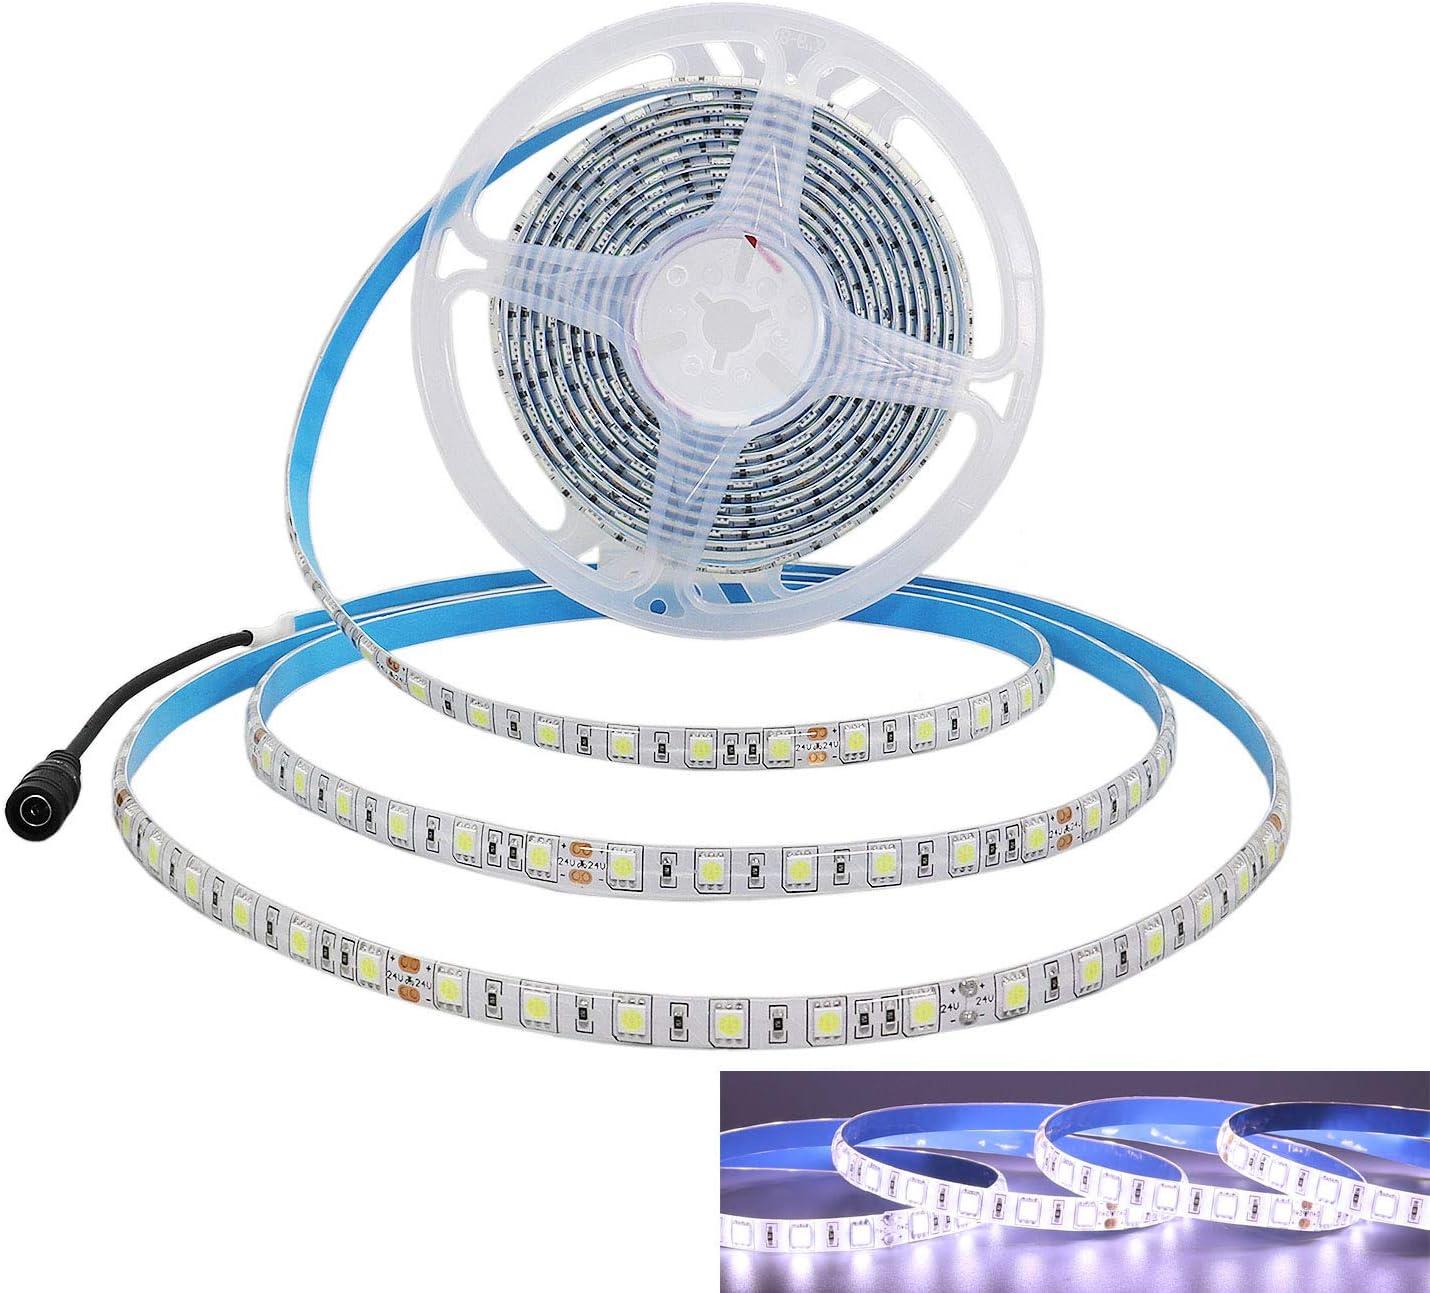 JOYLIT Tiras LED 24V Blanco frío 6000-6500K 300 LEDs SMD5050 IP65 Impermeable 5 metros